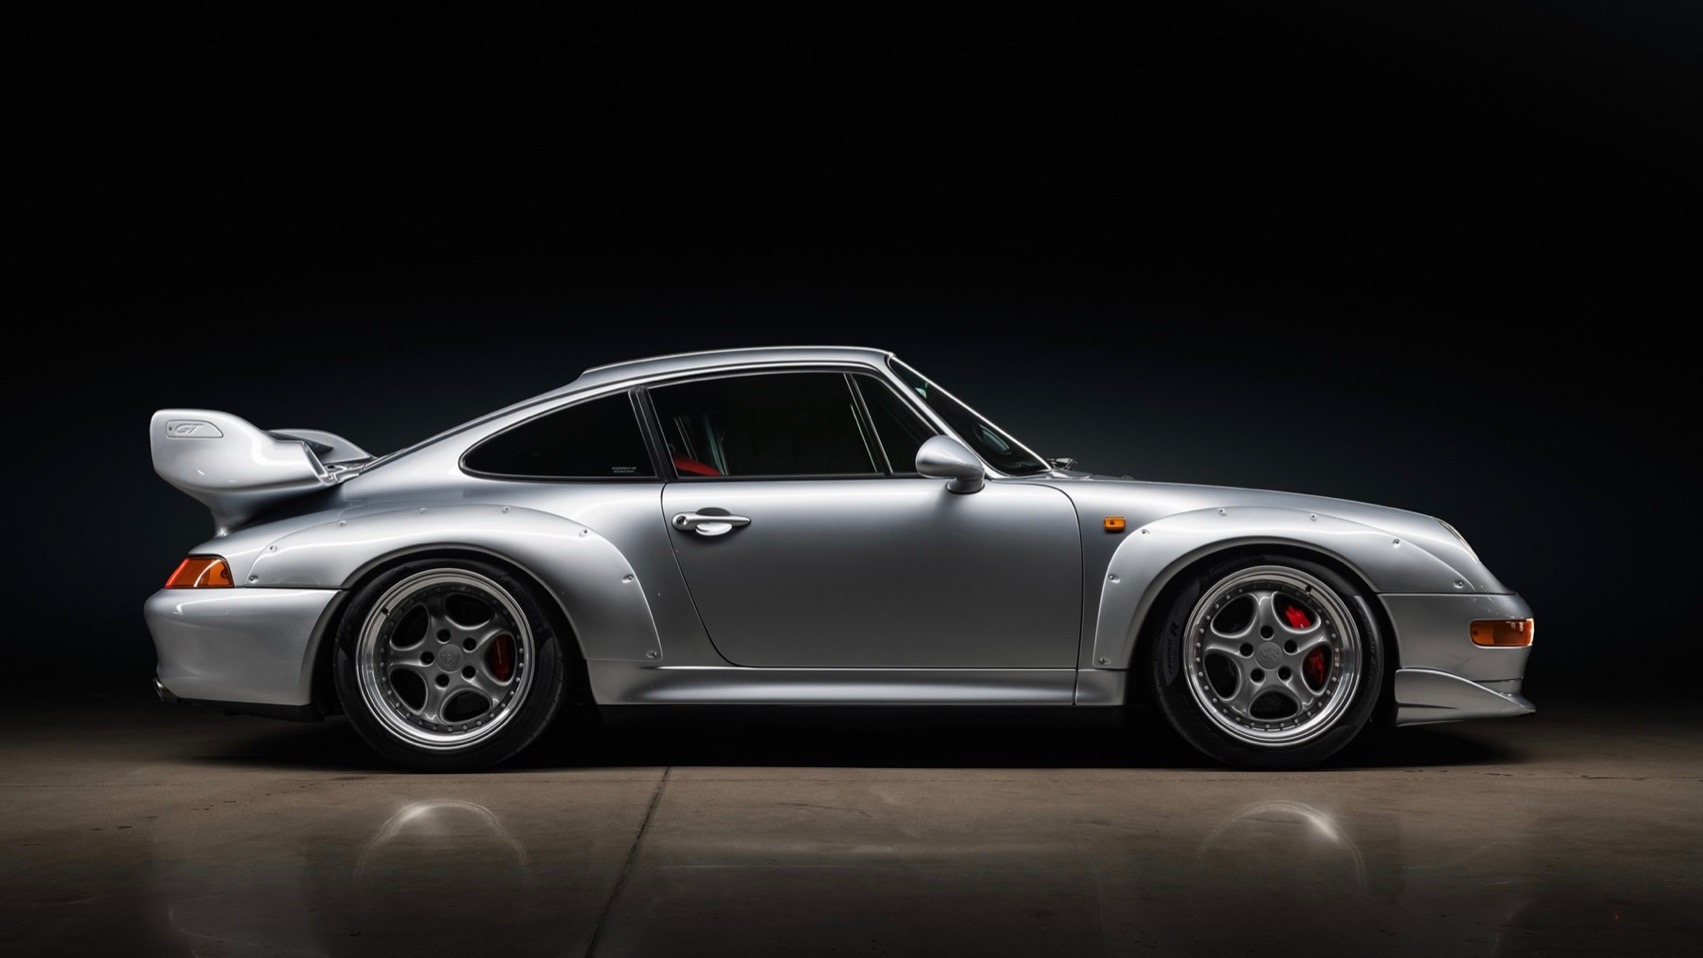 photo of 1996 Porsche 911 GT2 for sale through online auction image